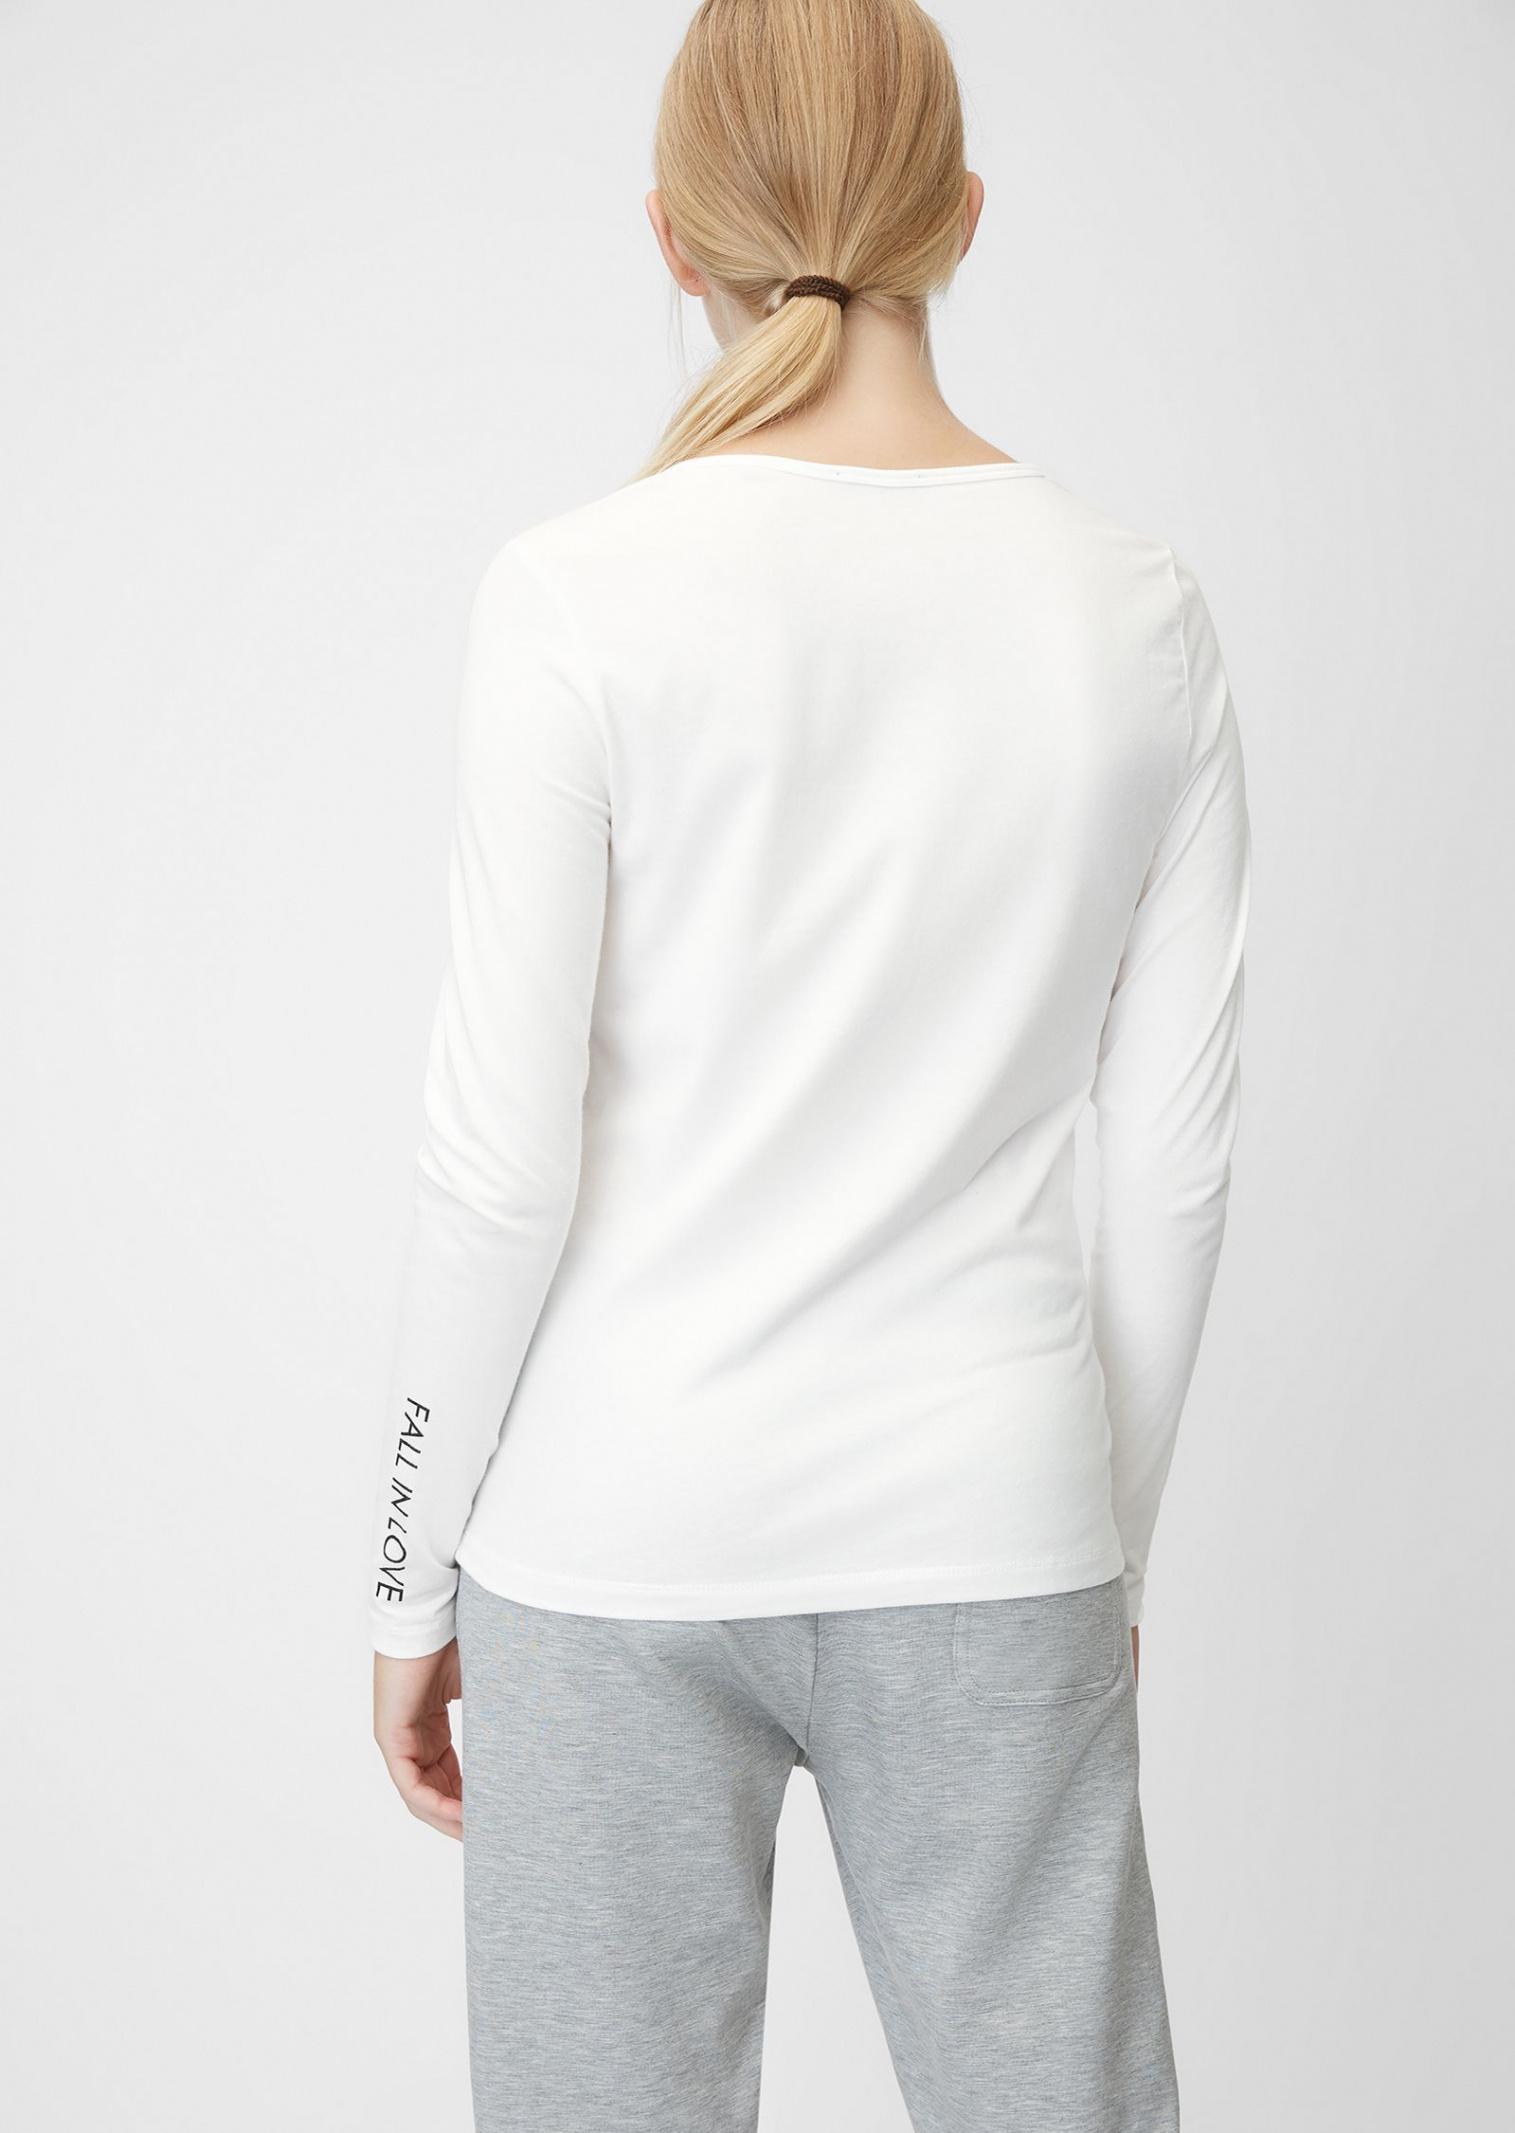 Кофты и свитера женские MARC O'POLO модель PF3944 , 2017